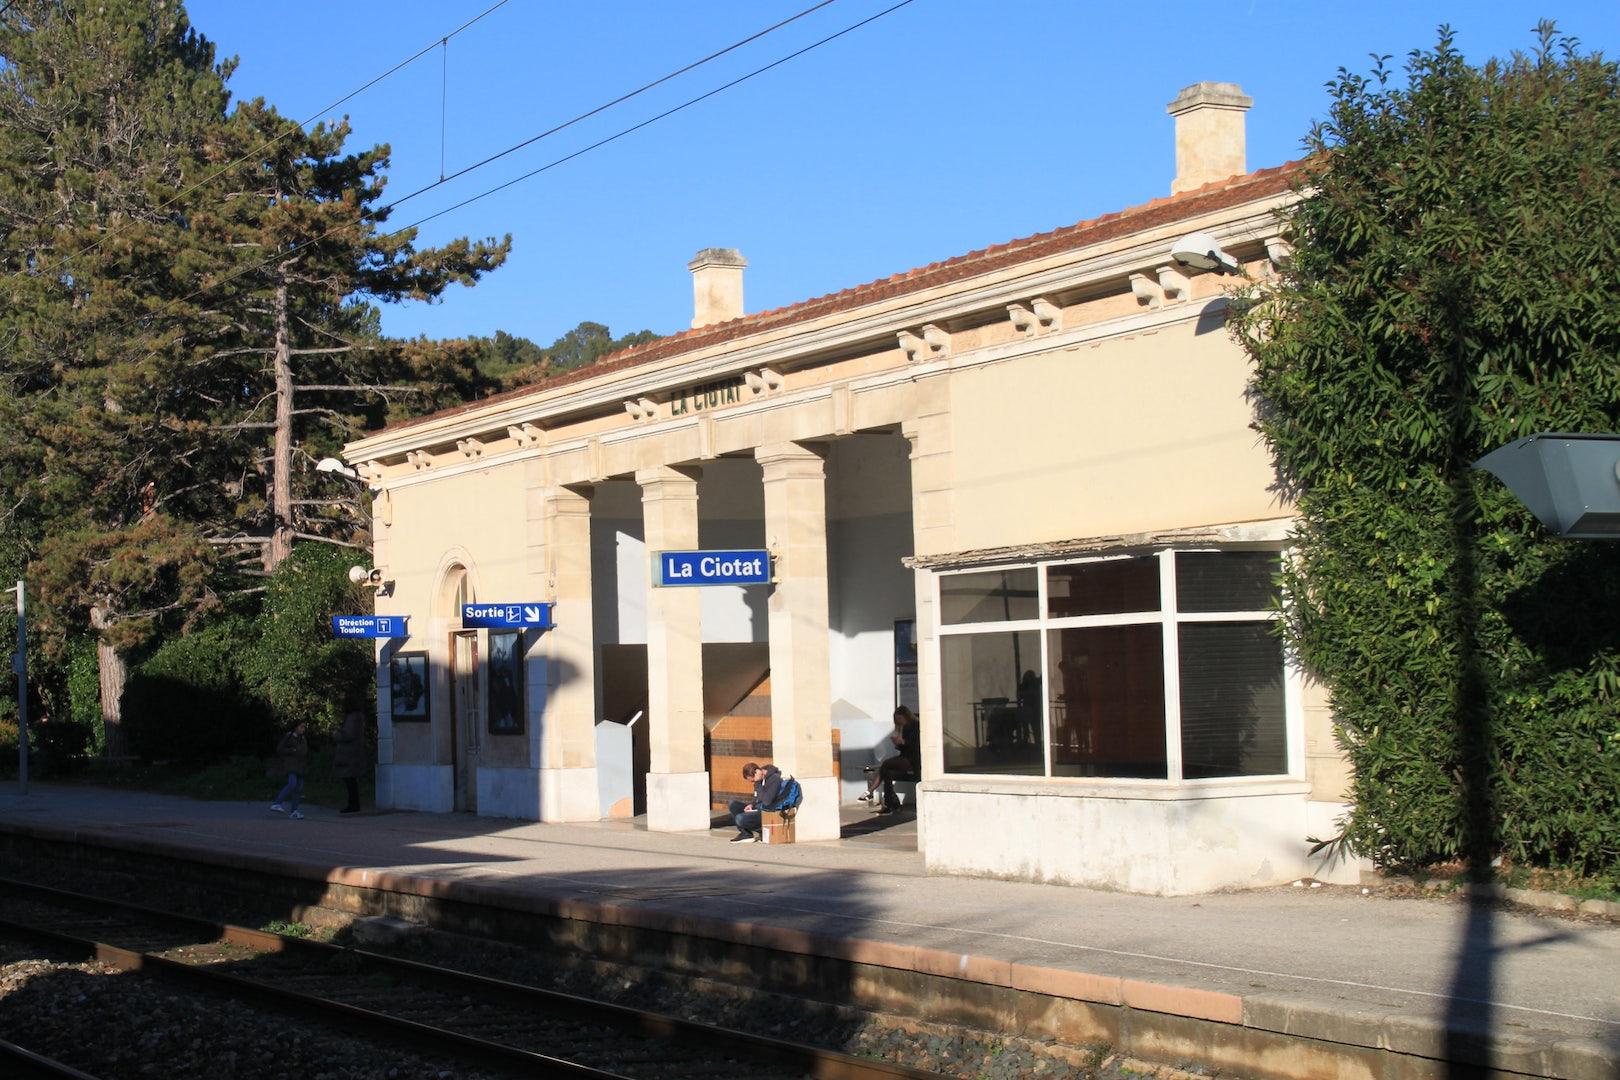 cute little train station of La Ciotat in France